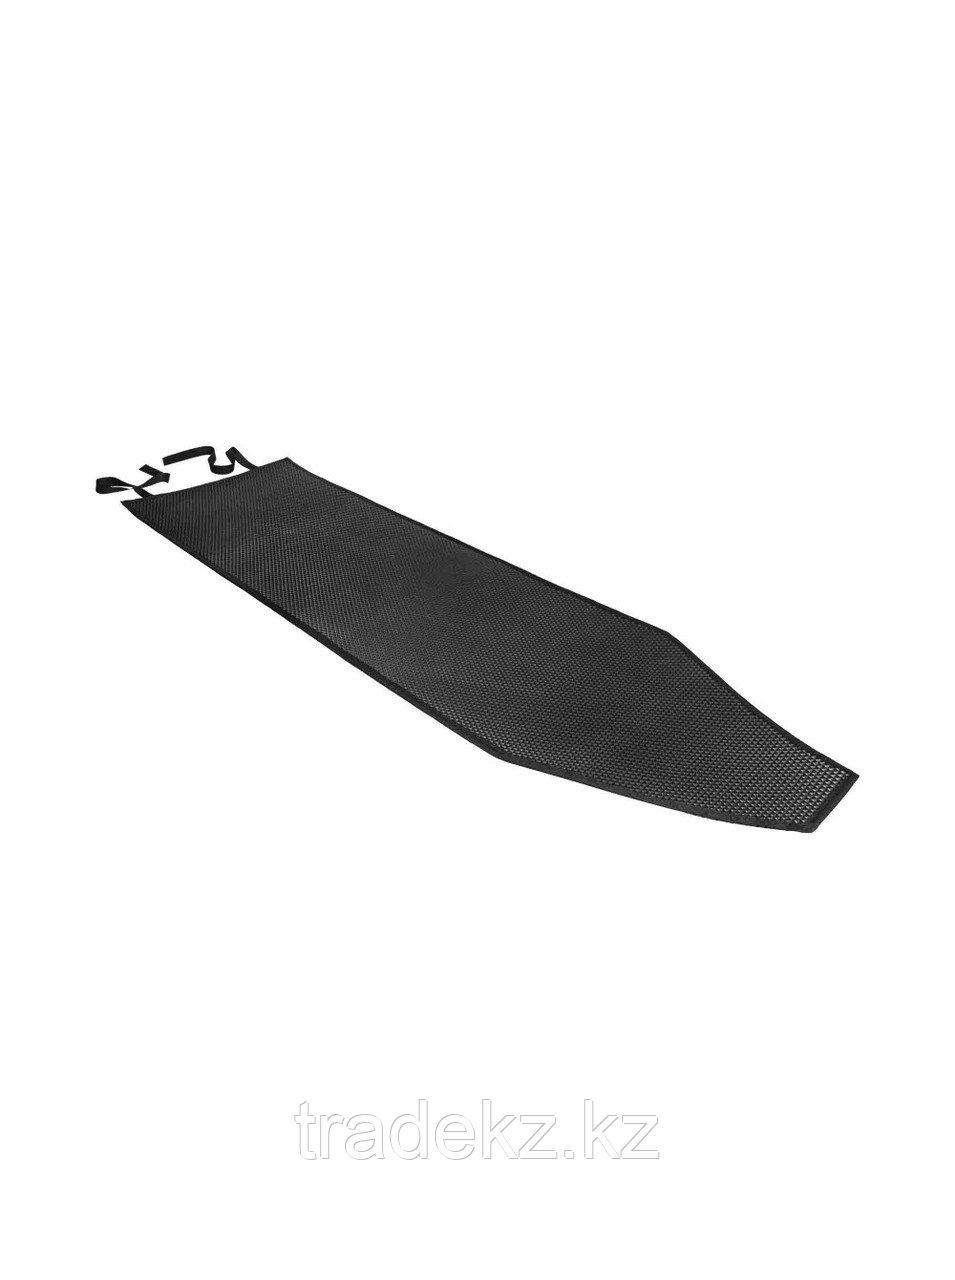 Коврик ЭВА EVA Standart по форме дна для лодки АПАЧИ 3500 СК (APACHE 3500 СК)